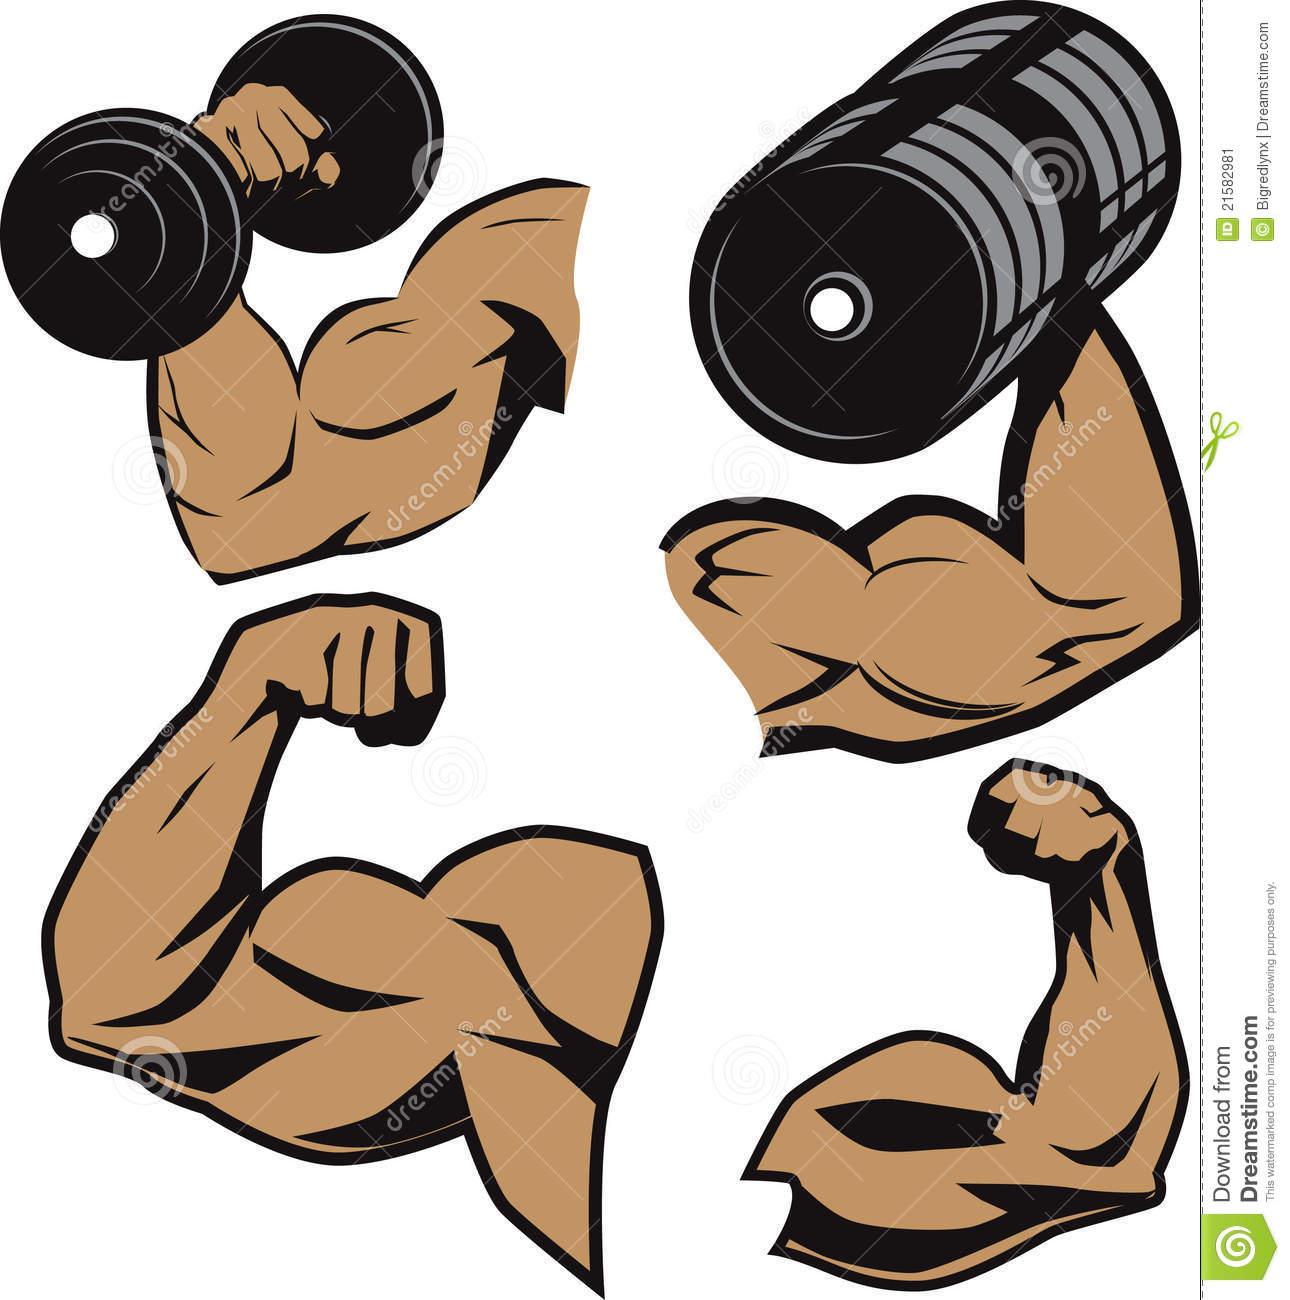 1290x1300 Muscle Cartoon Clipart